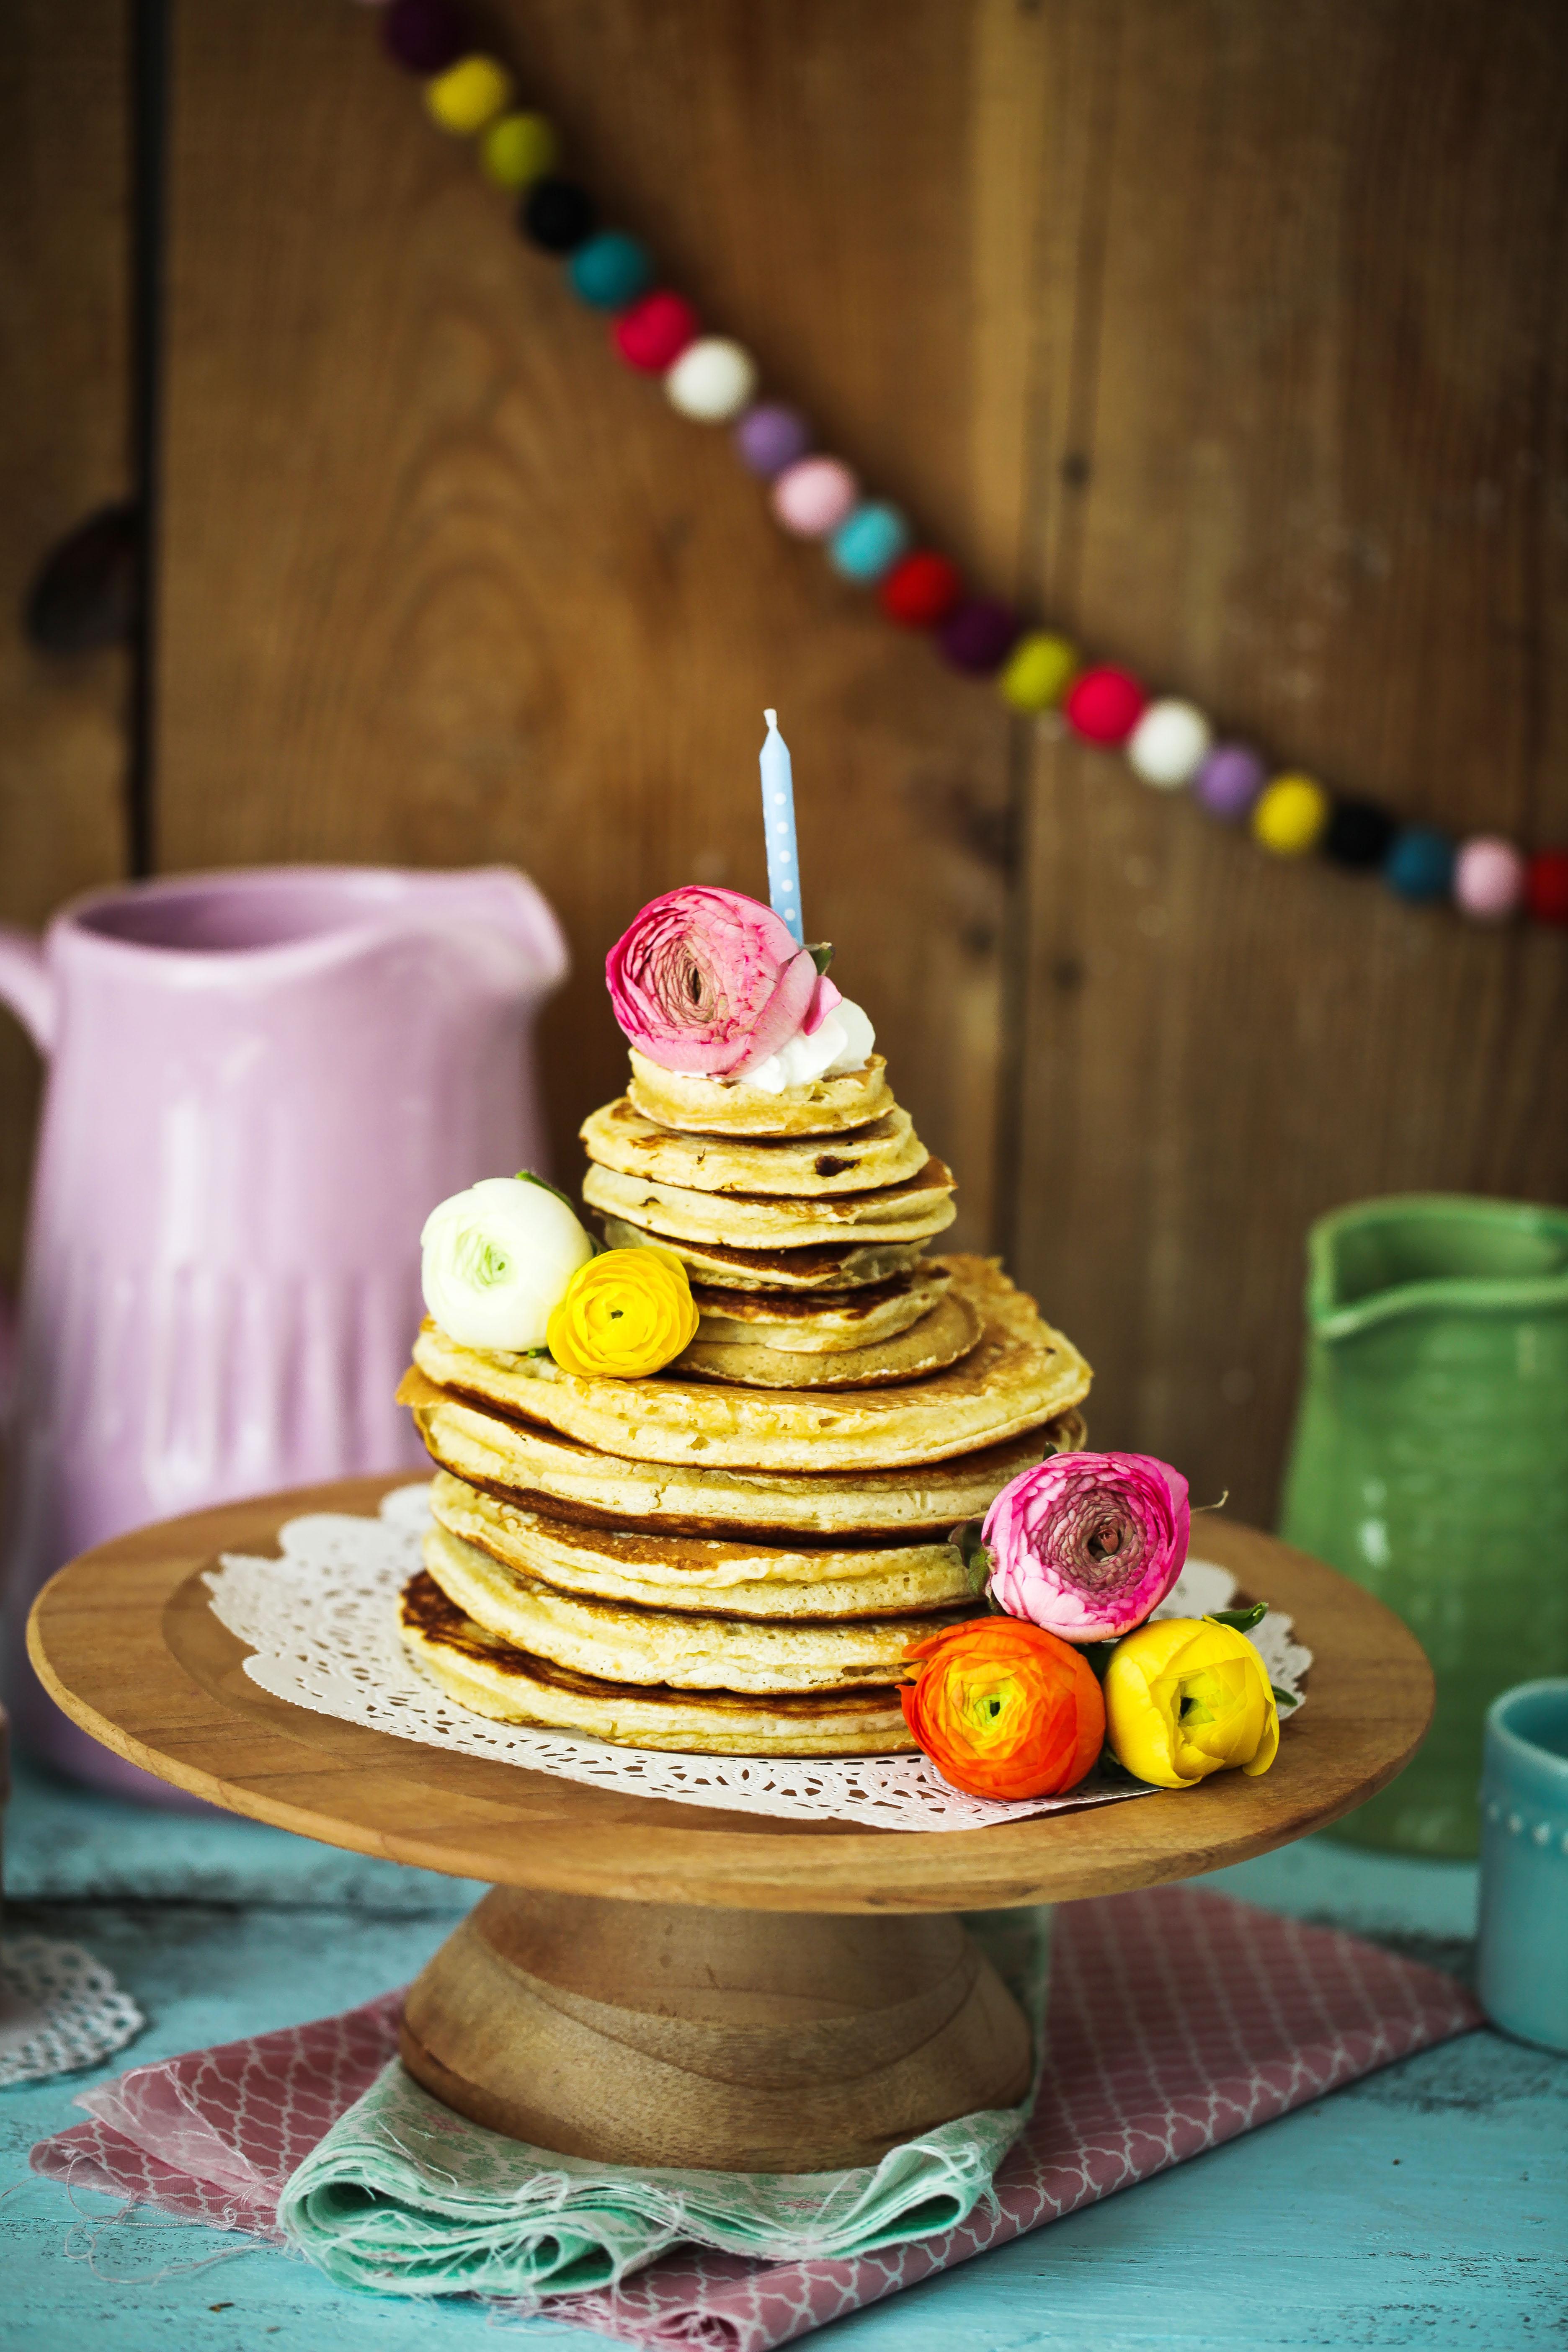 Zuckerzimtundliebe Rezept Zitronen Buttermilch Pancakes Geburtstagstorte Lecker Weltrekord-8b